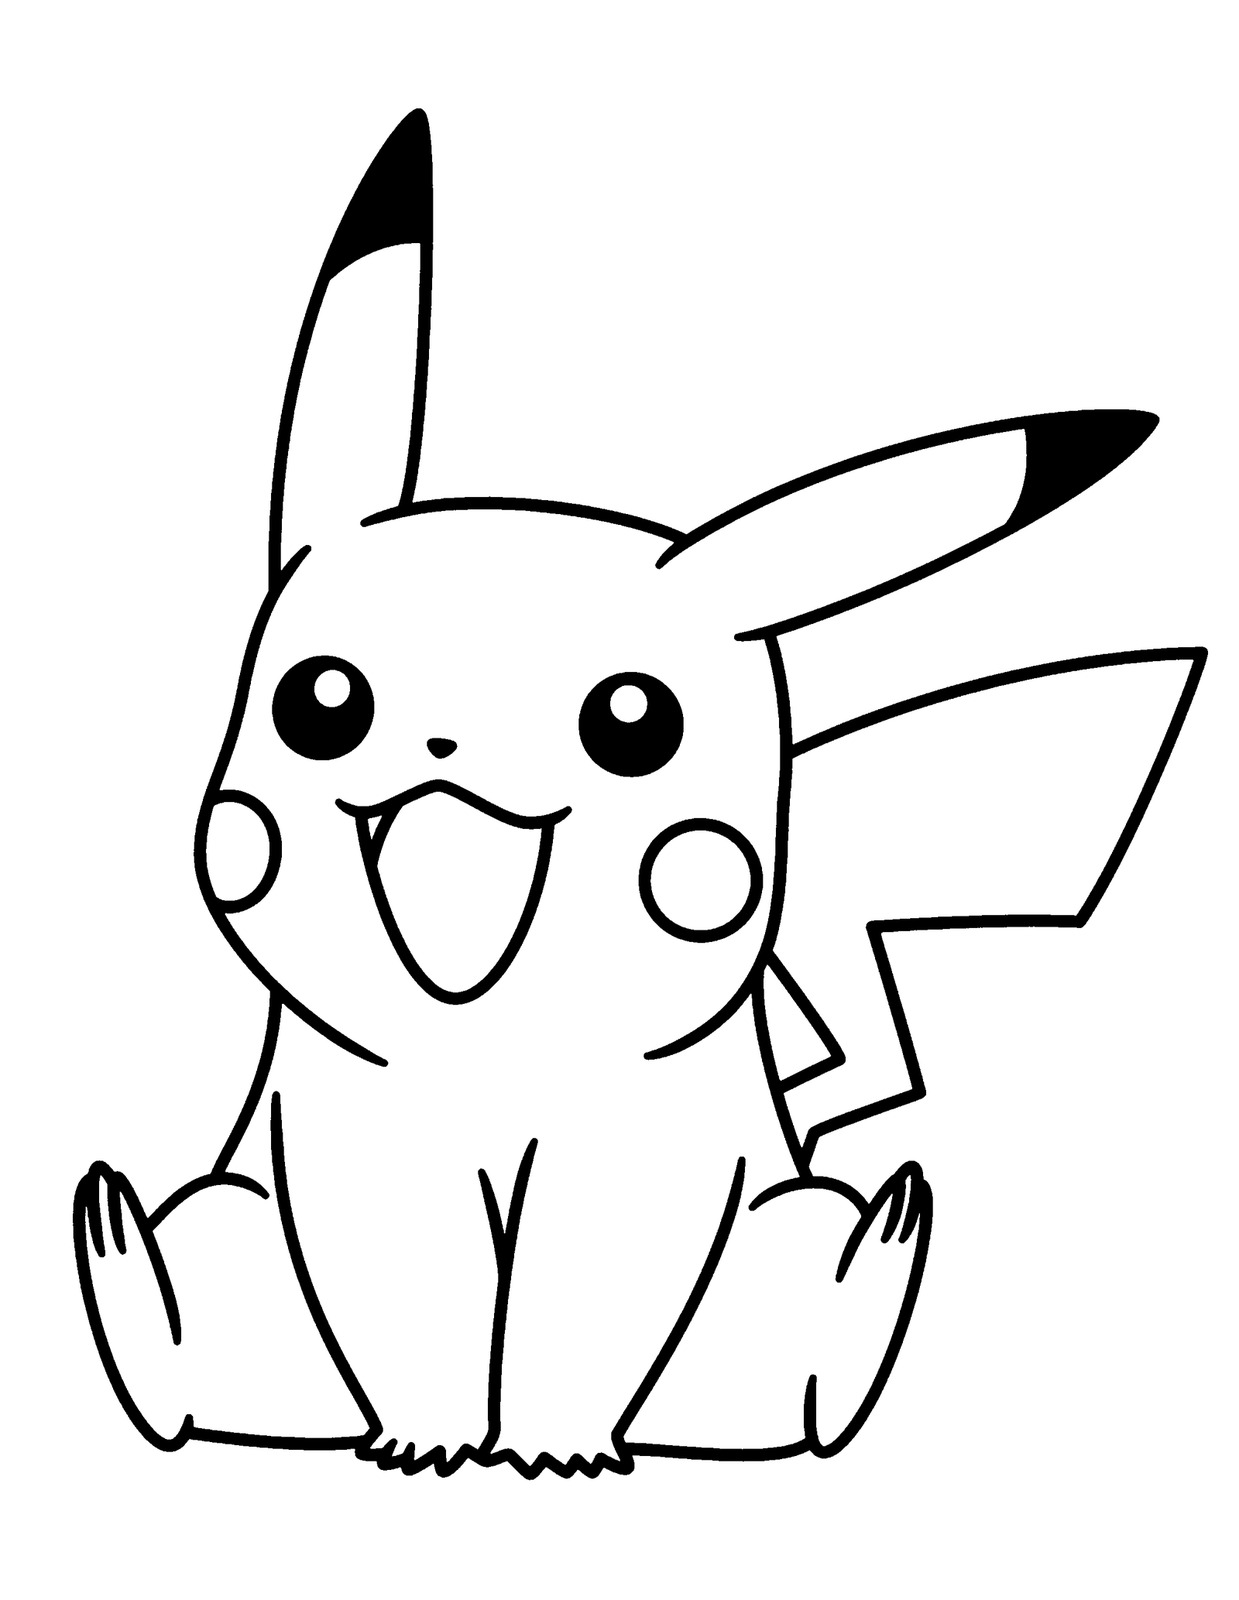 drawing-pokemon-33.jpg